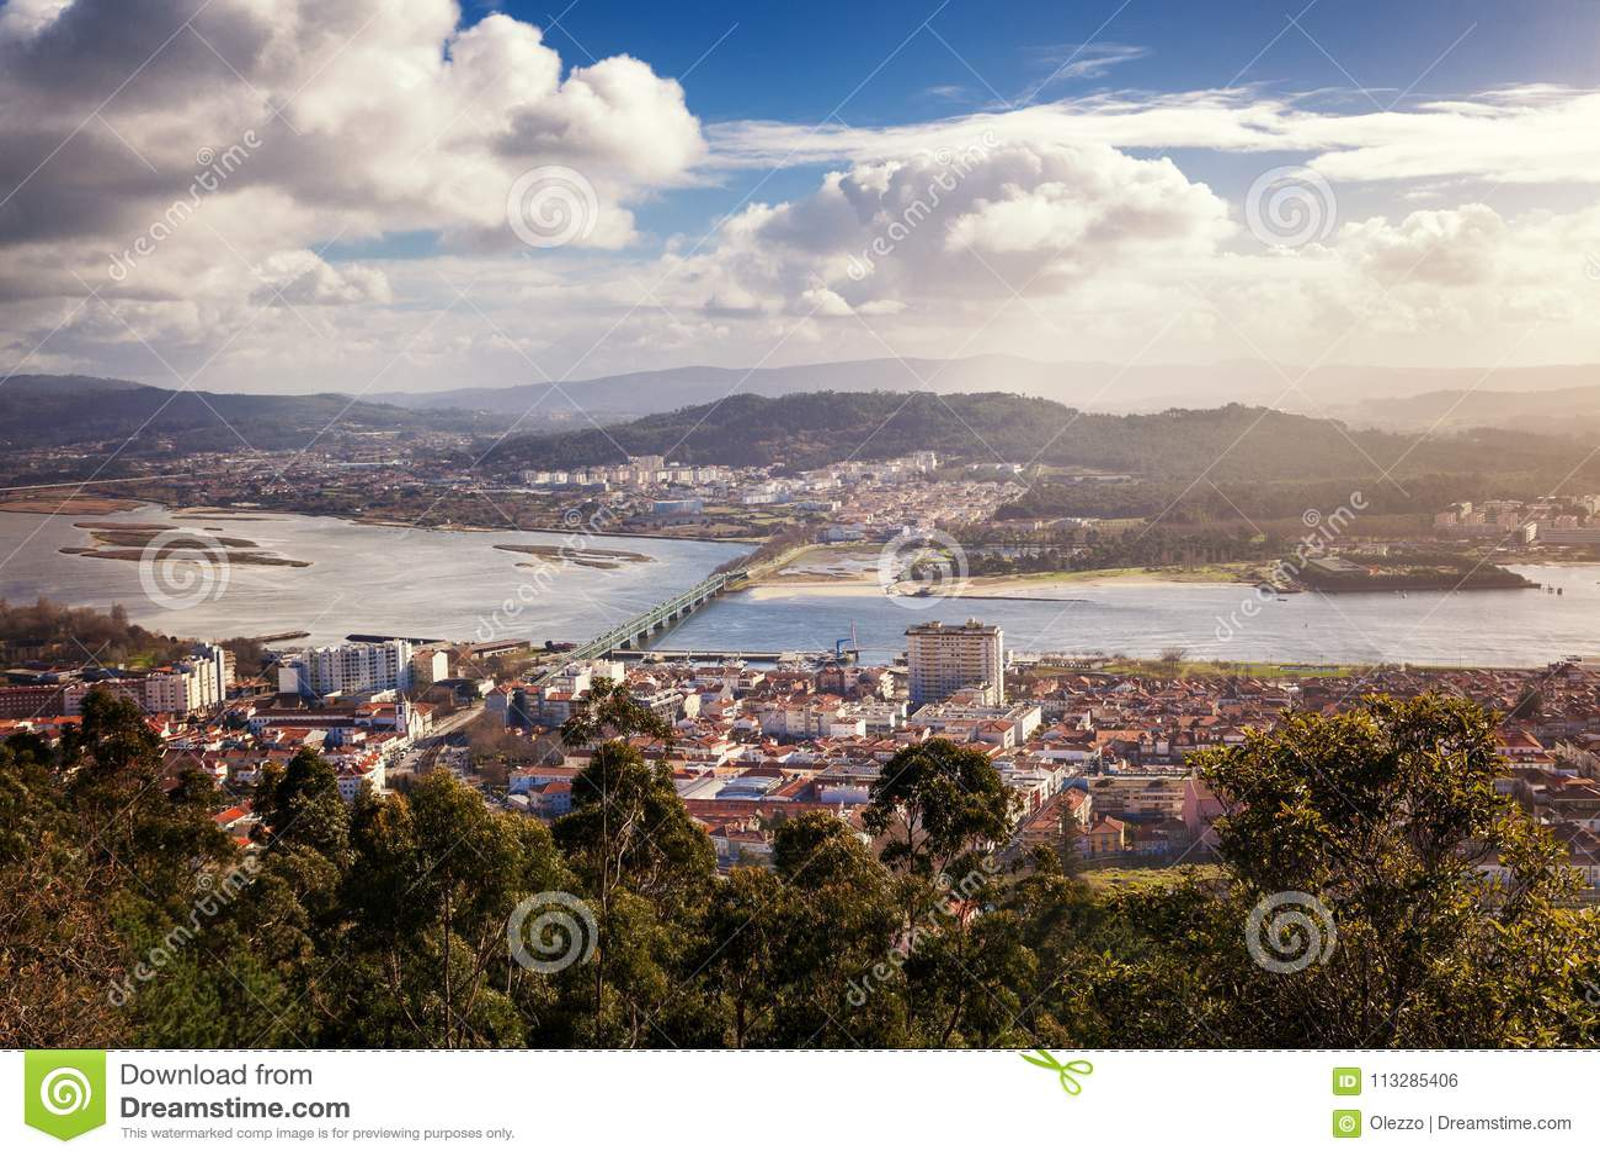 Viana Do Castelo, widok miasto od wzrosta, piękny miasto